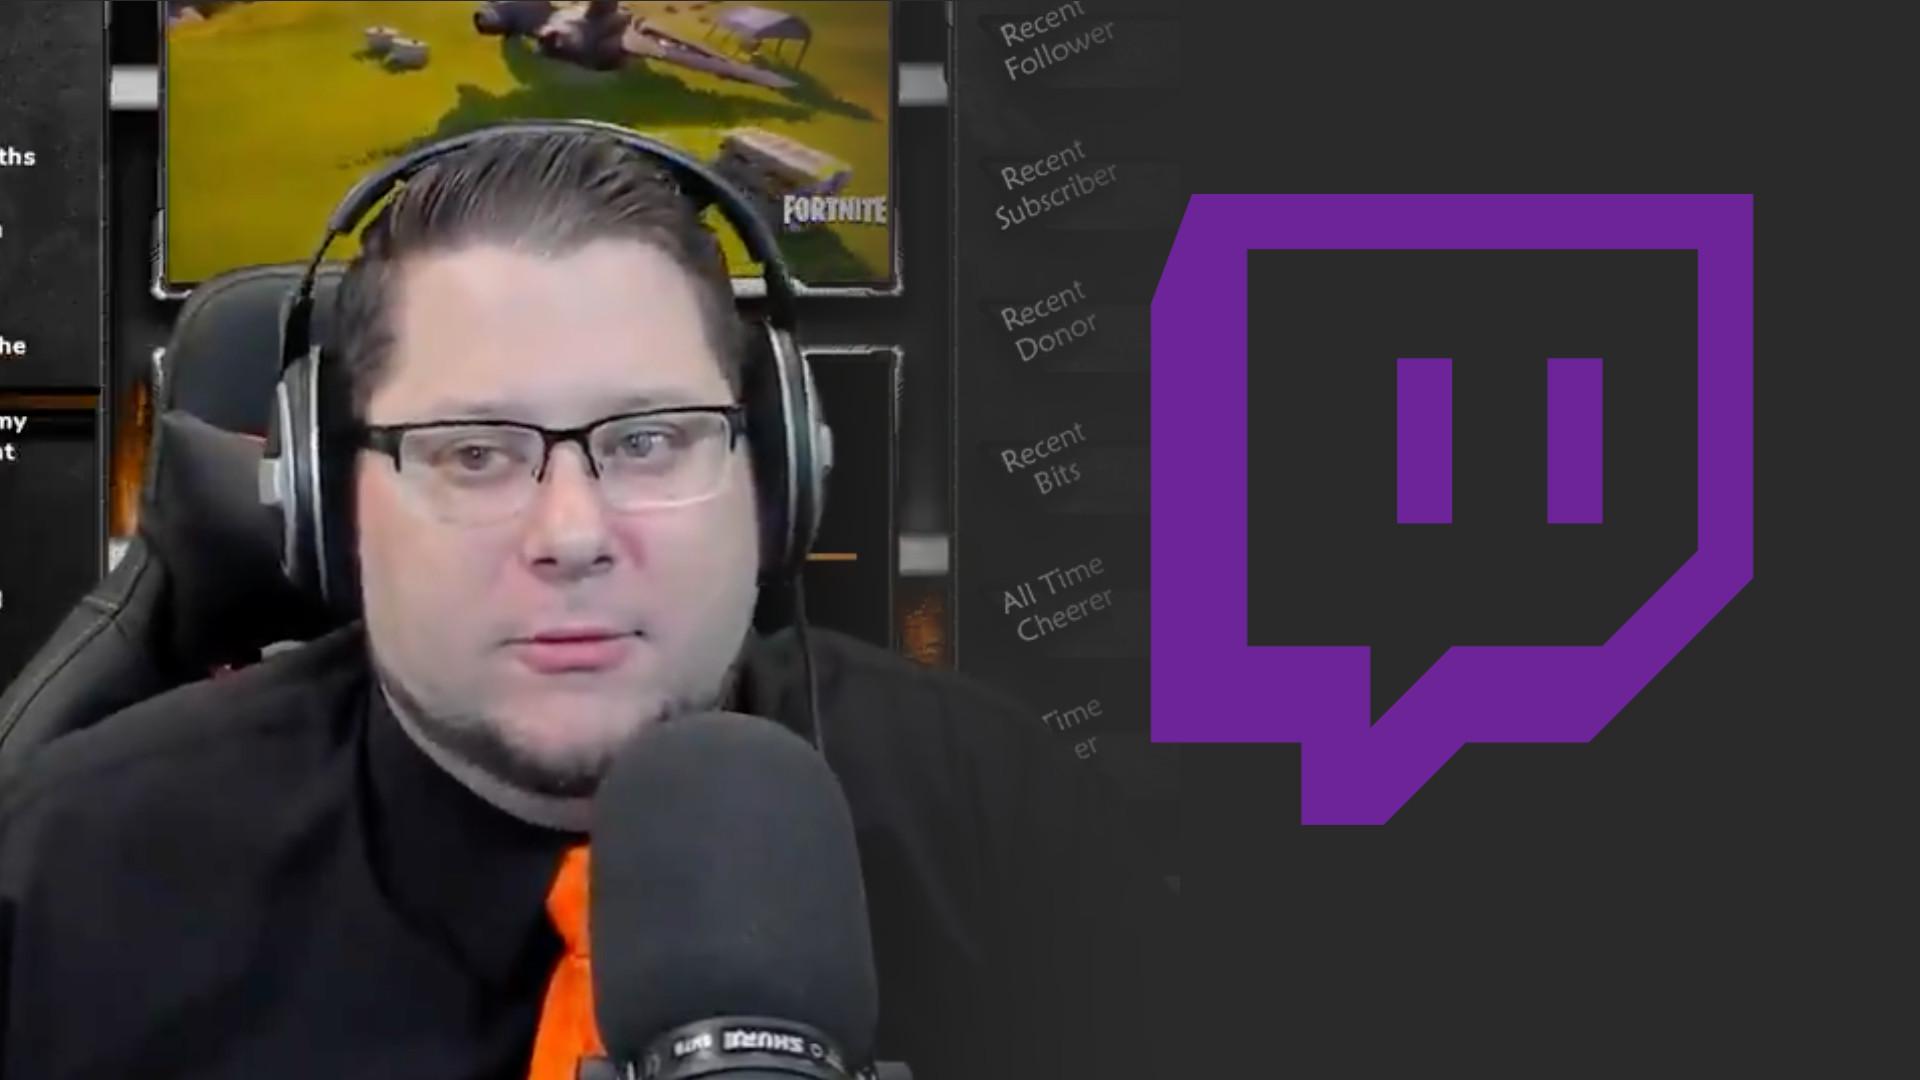 drwitnesser twitch ban